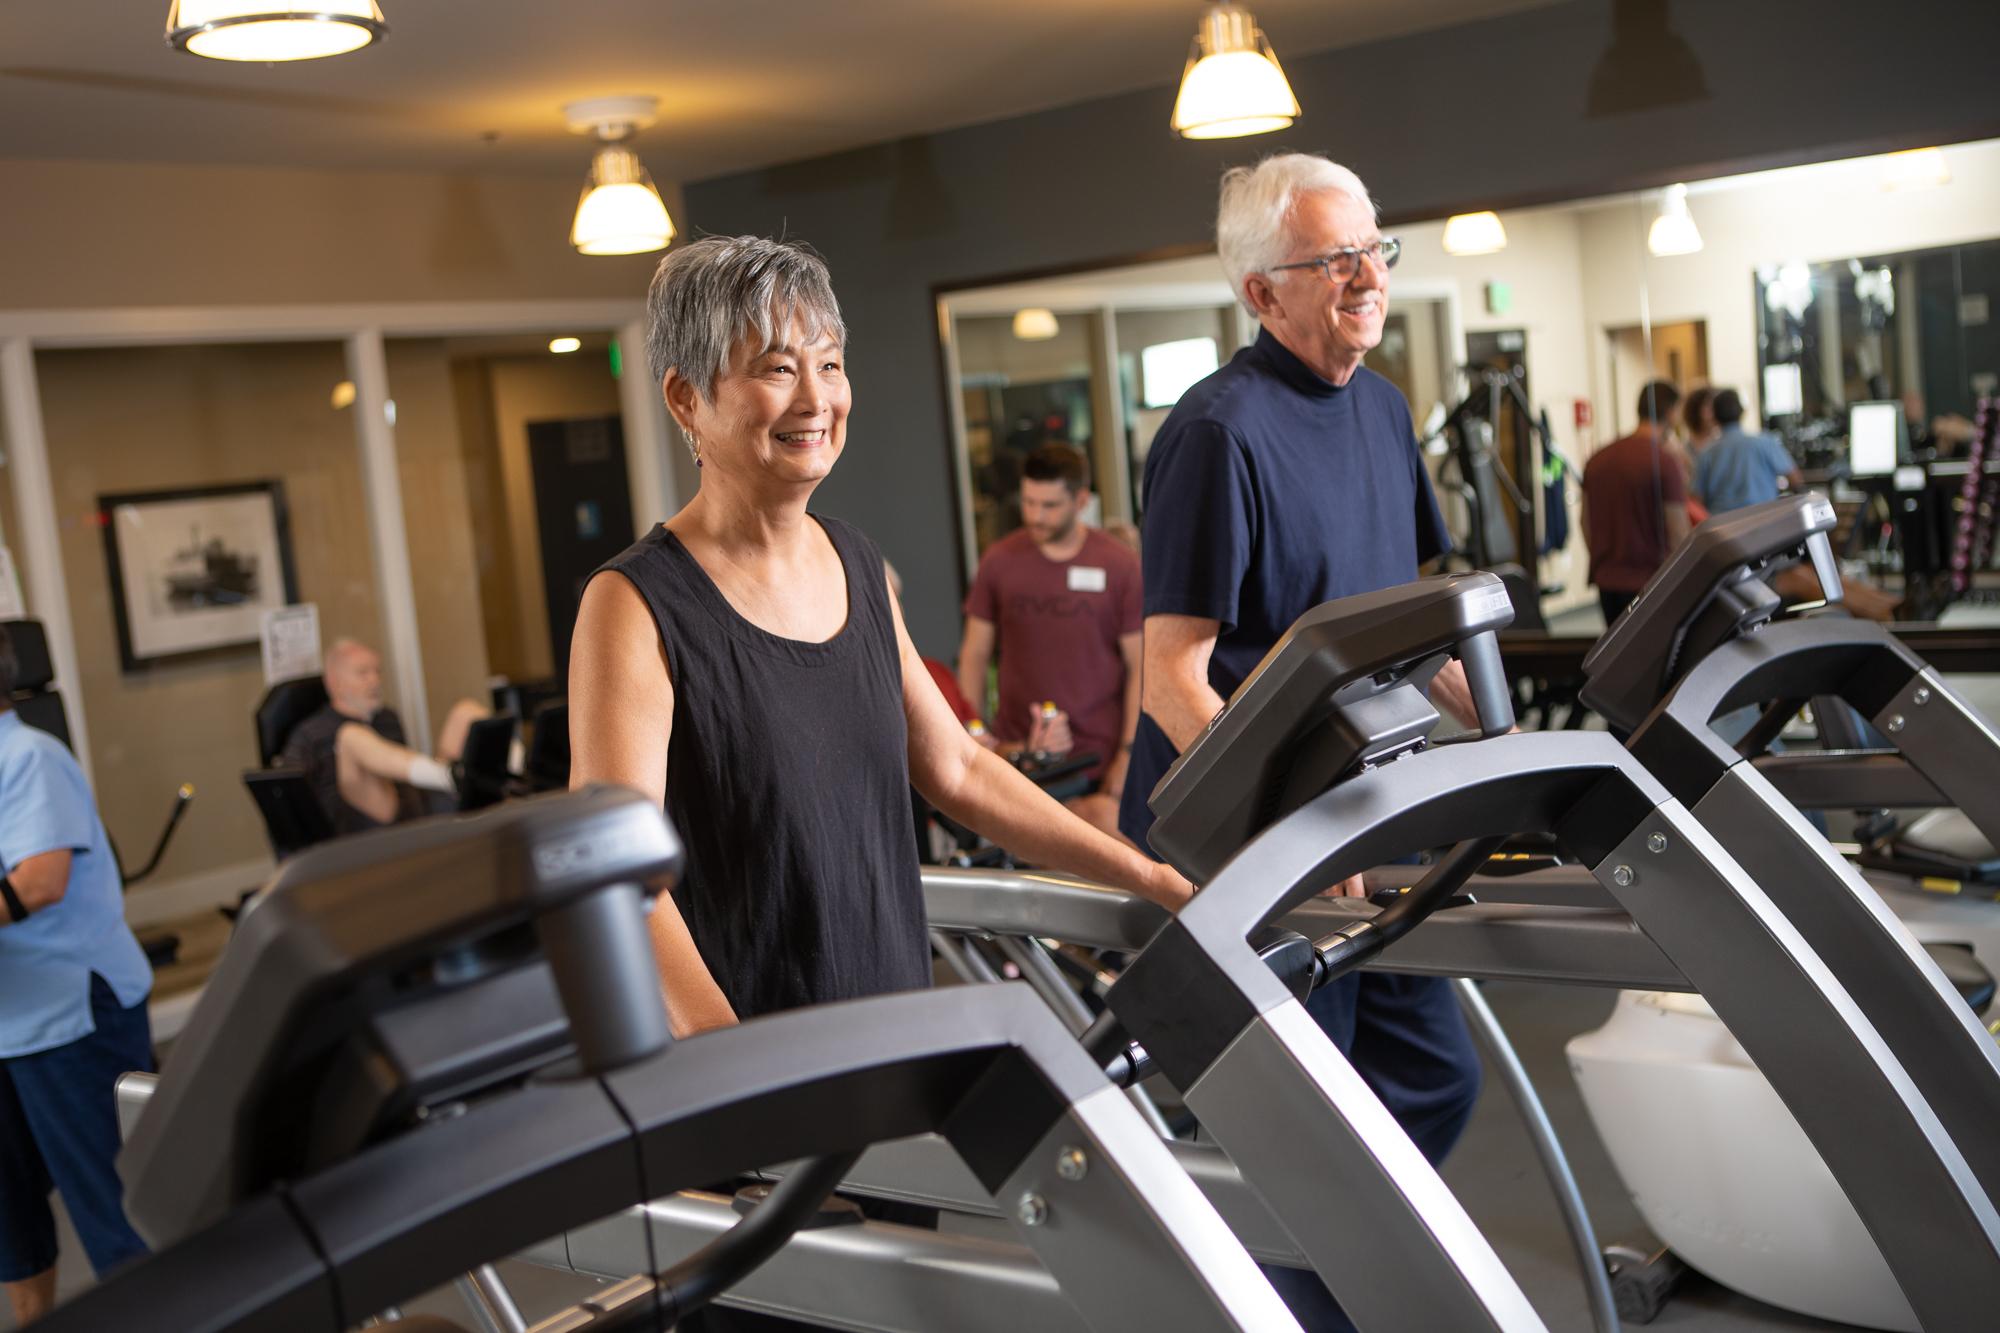 Heron s Key residents in fitness center